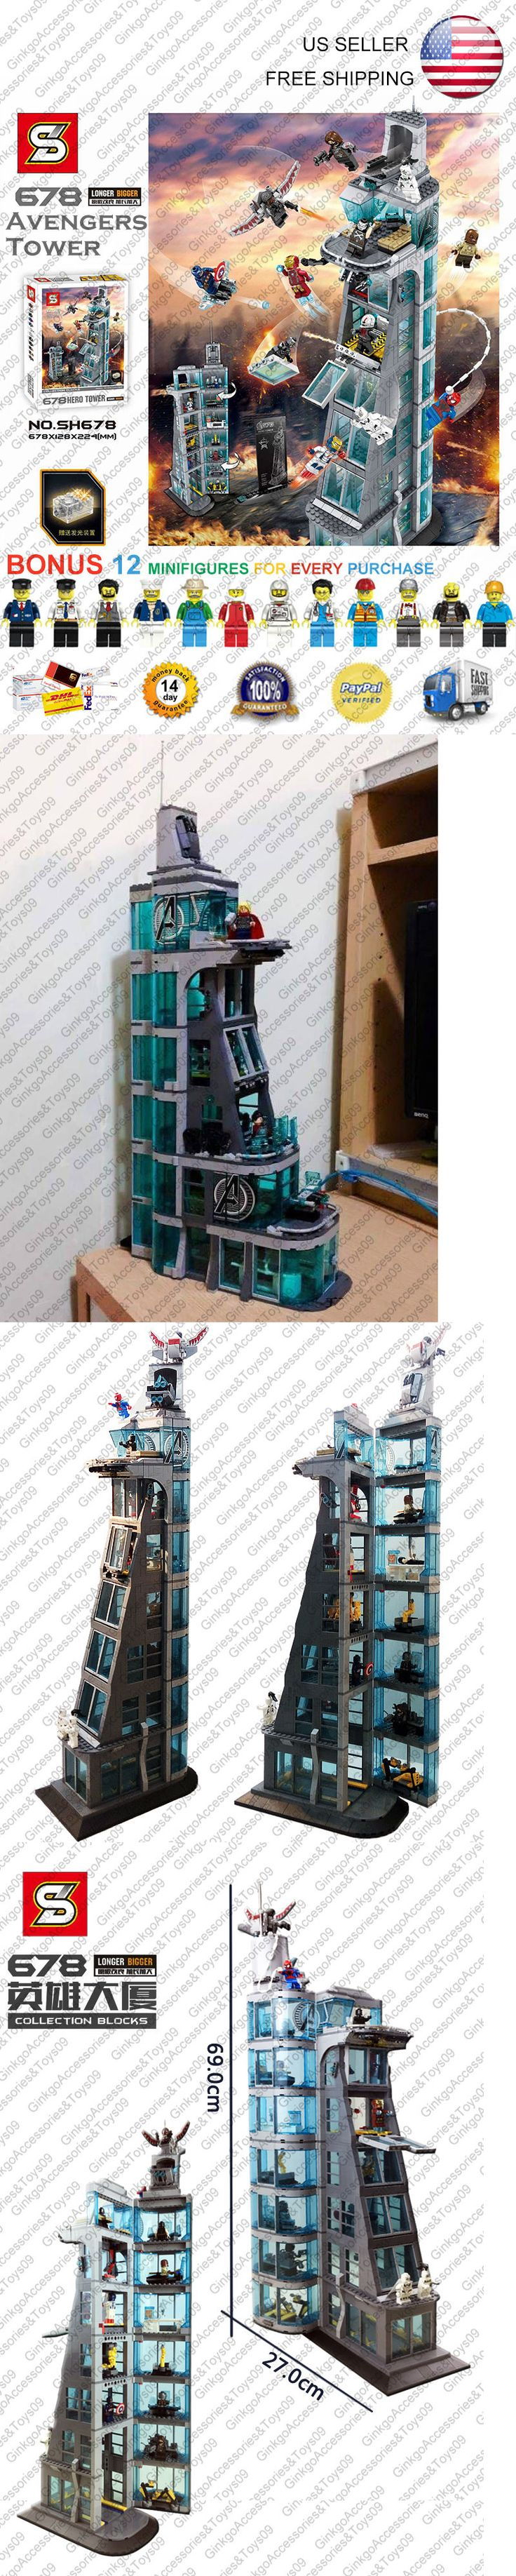 Blocks 18992: Marvel Hero Attack On Avengers Tower Sy678 76038 Building Kit Blocks 1209 Pcs -> BUY IT NOW ONLY: $76 on eBay!